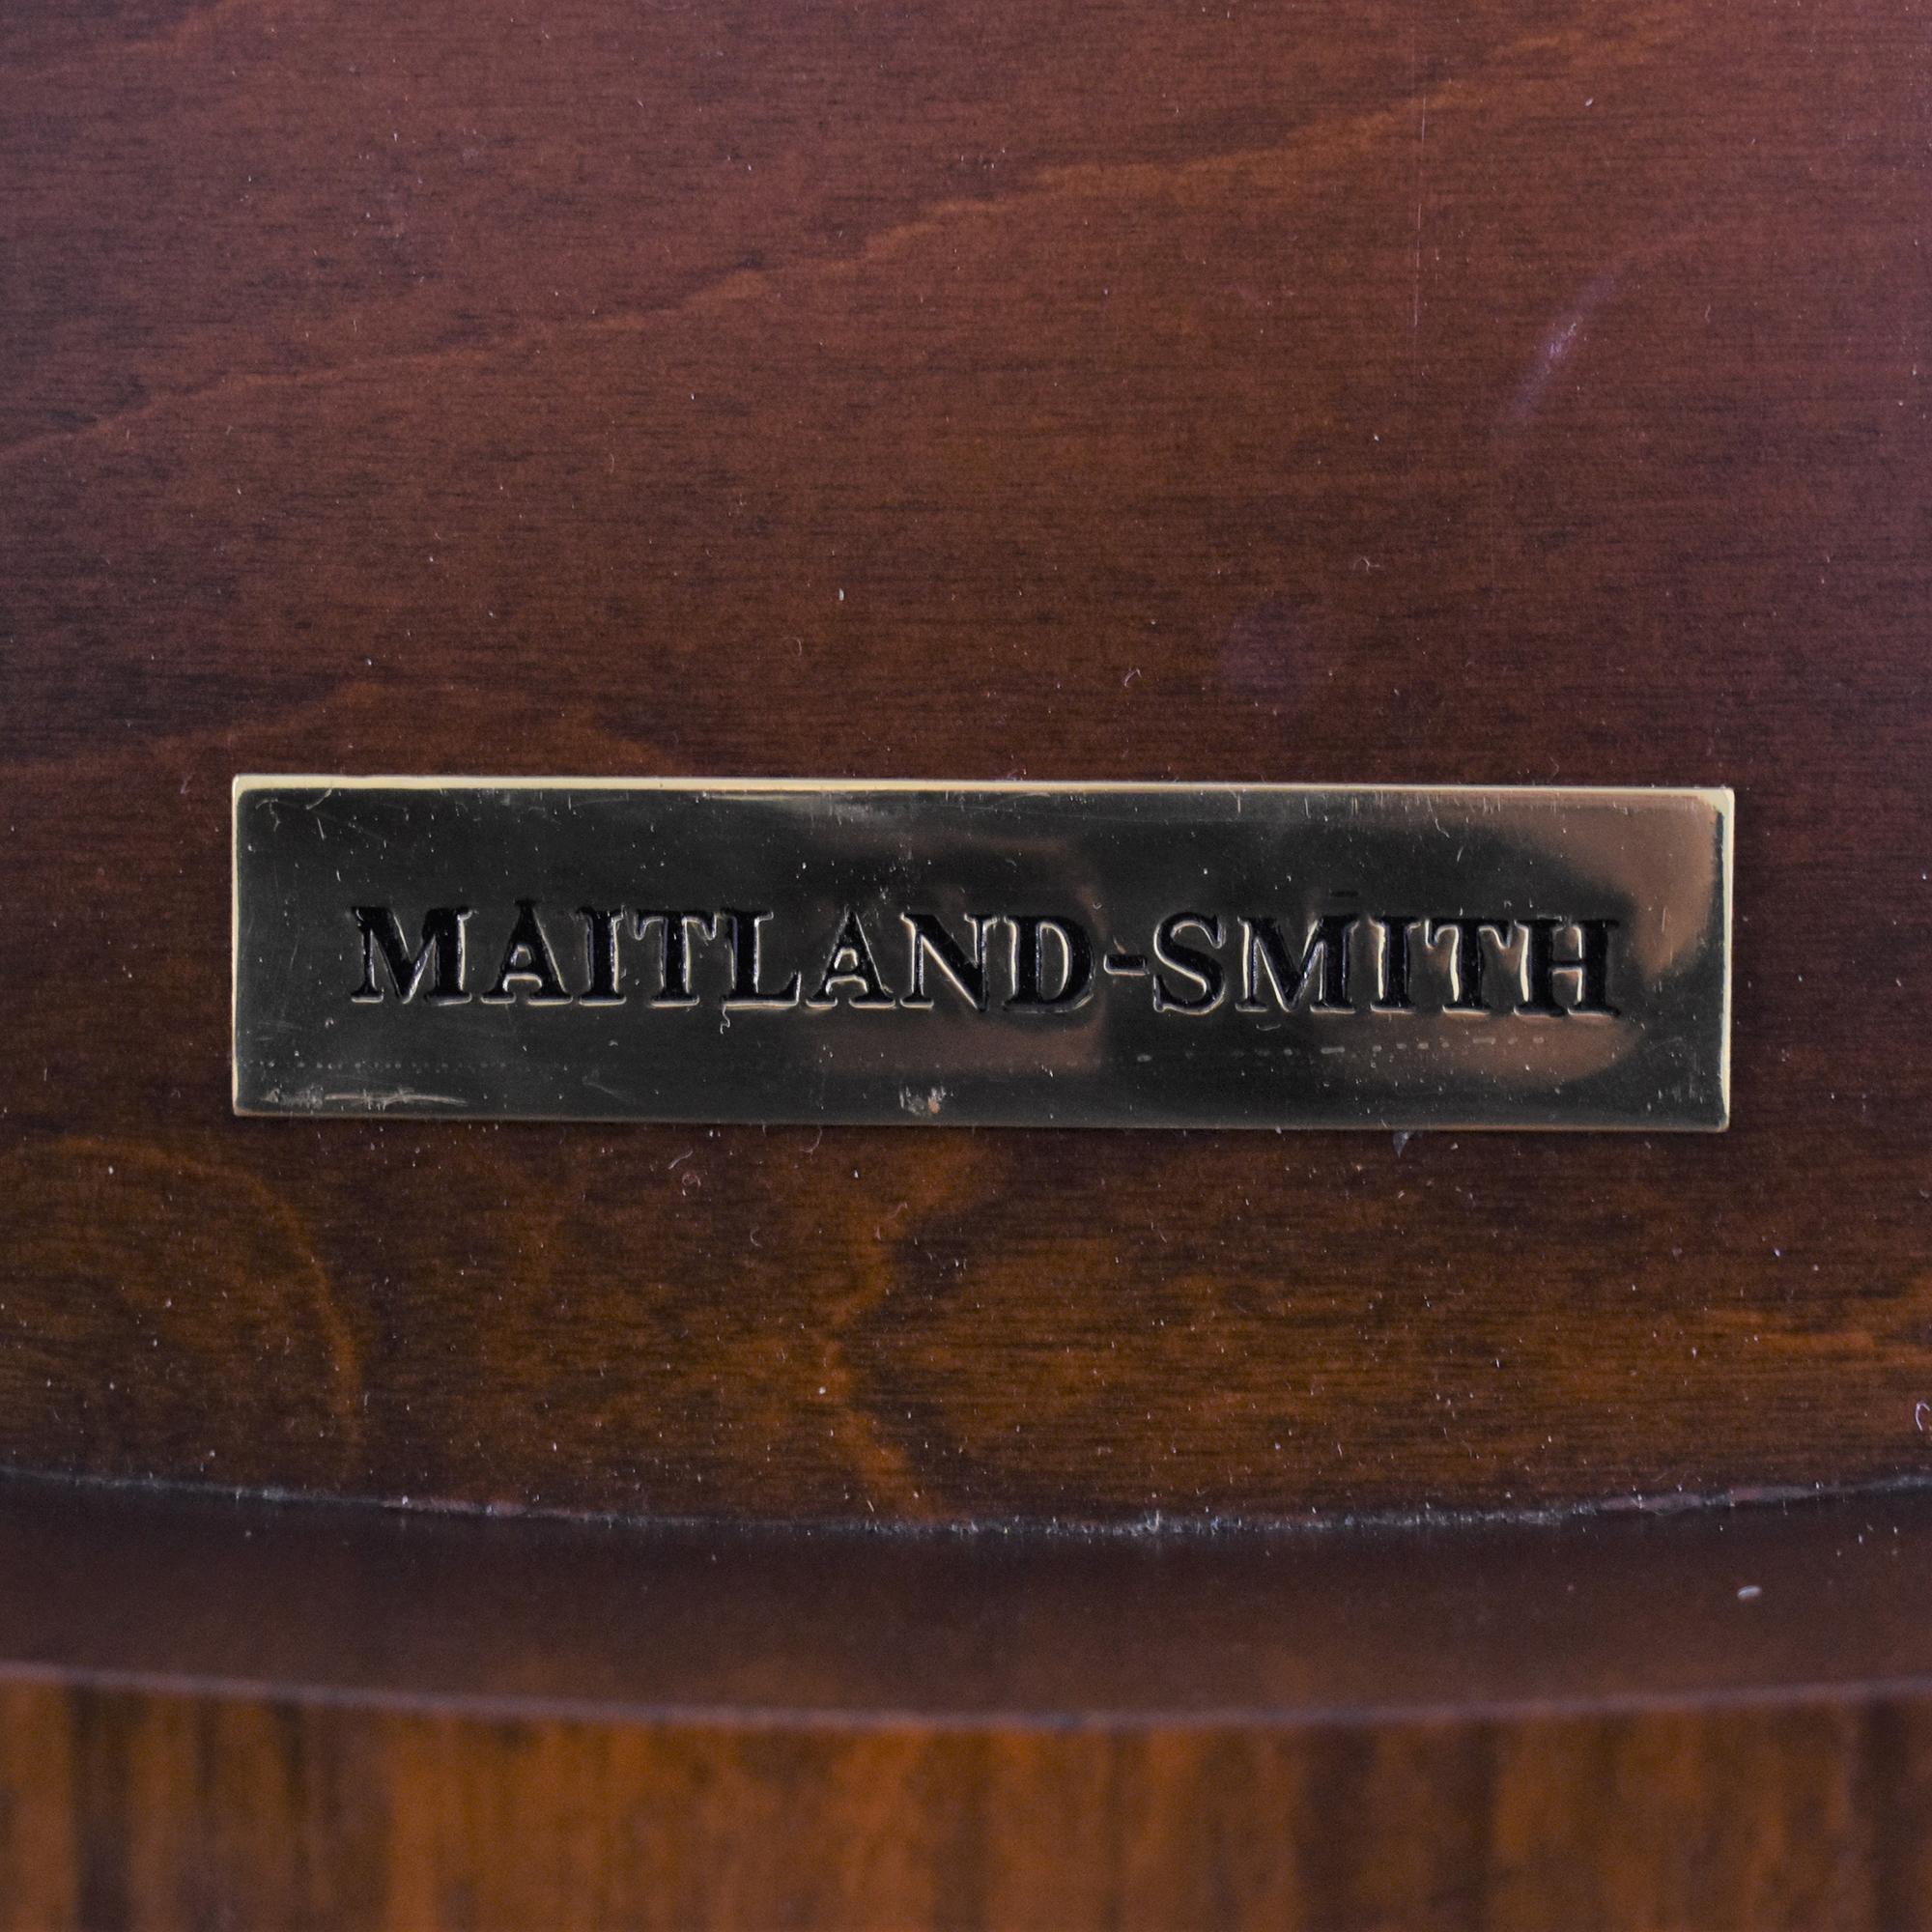 Maitland-Smith Maitland-Smith Center Table used